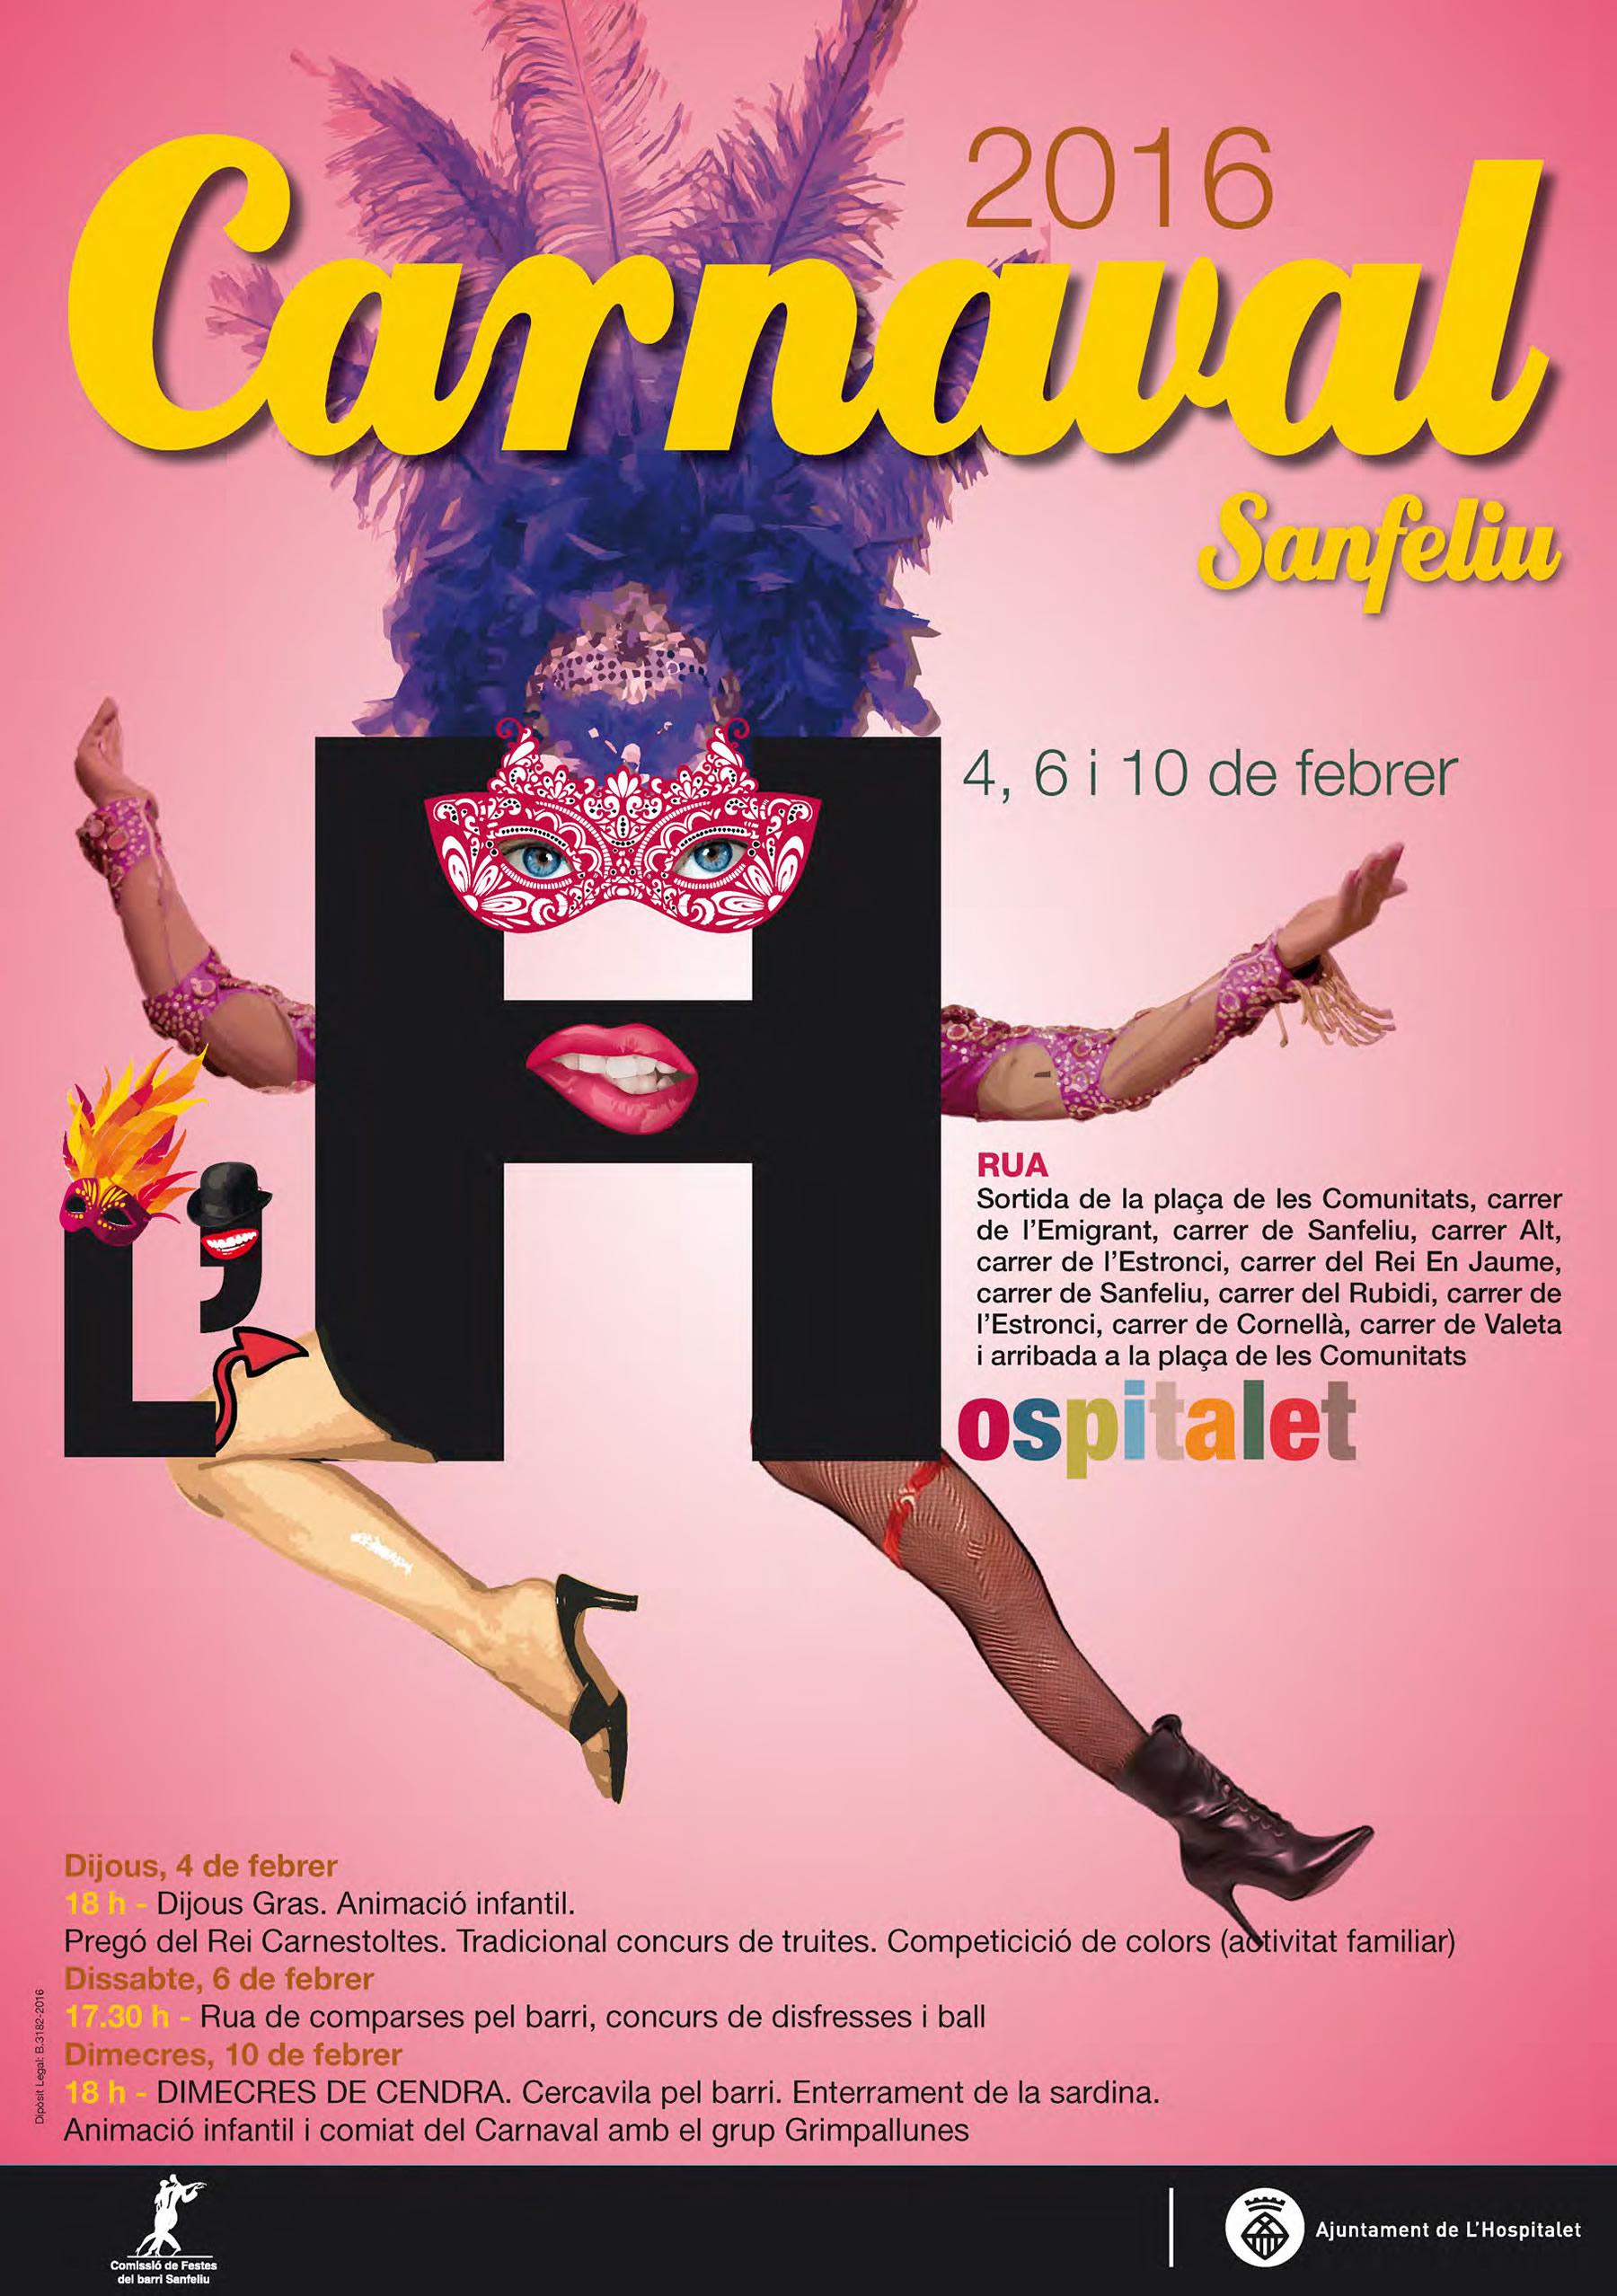 Carnaval Sanfeliu